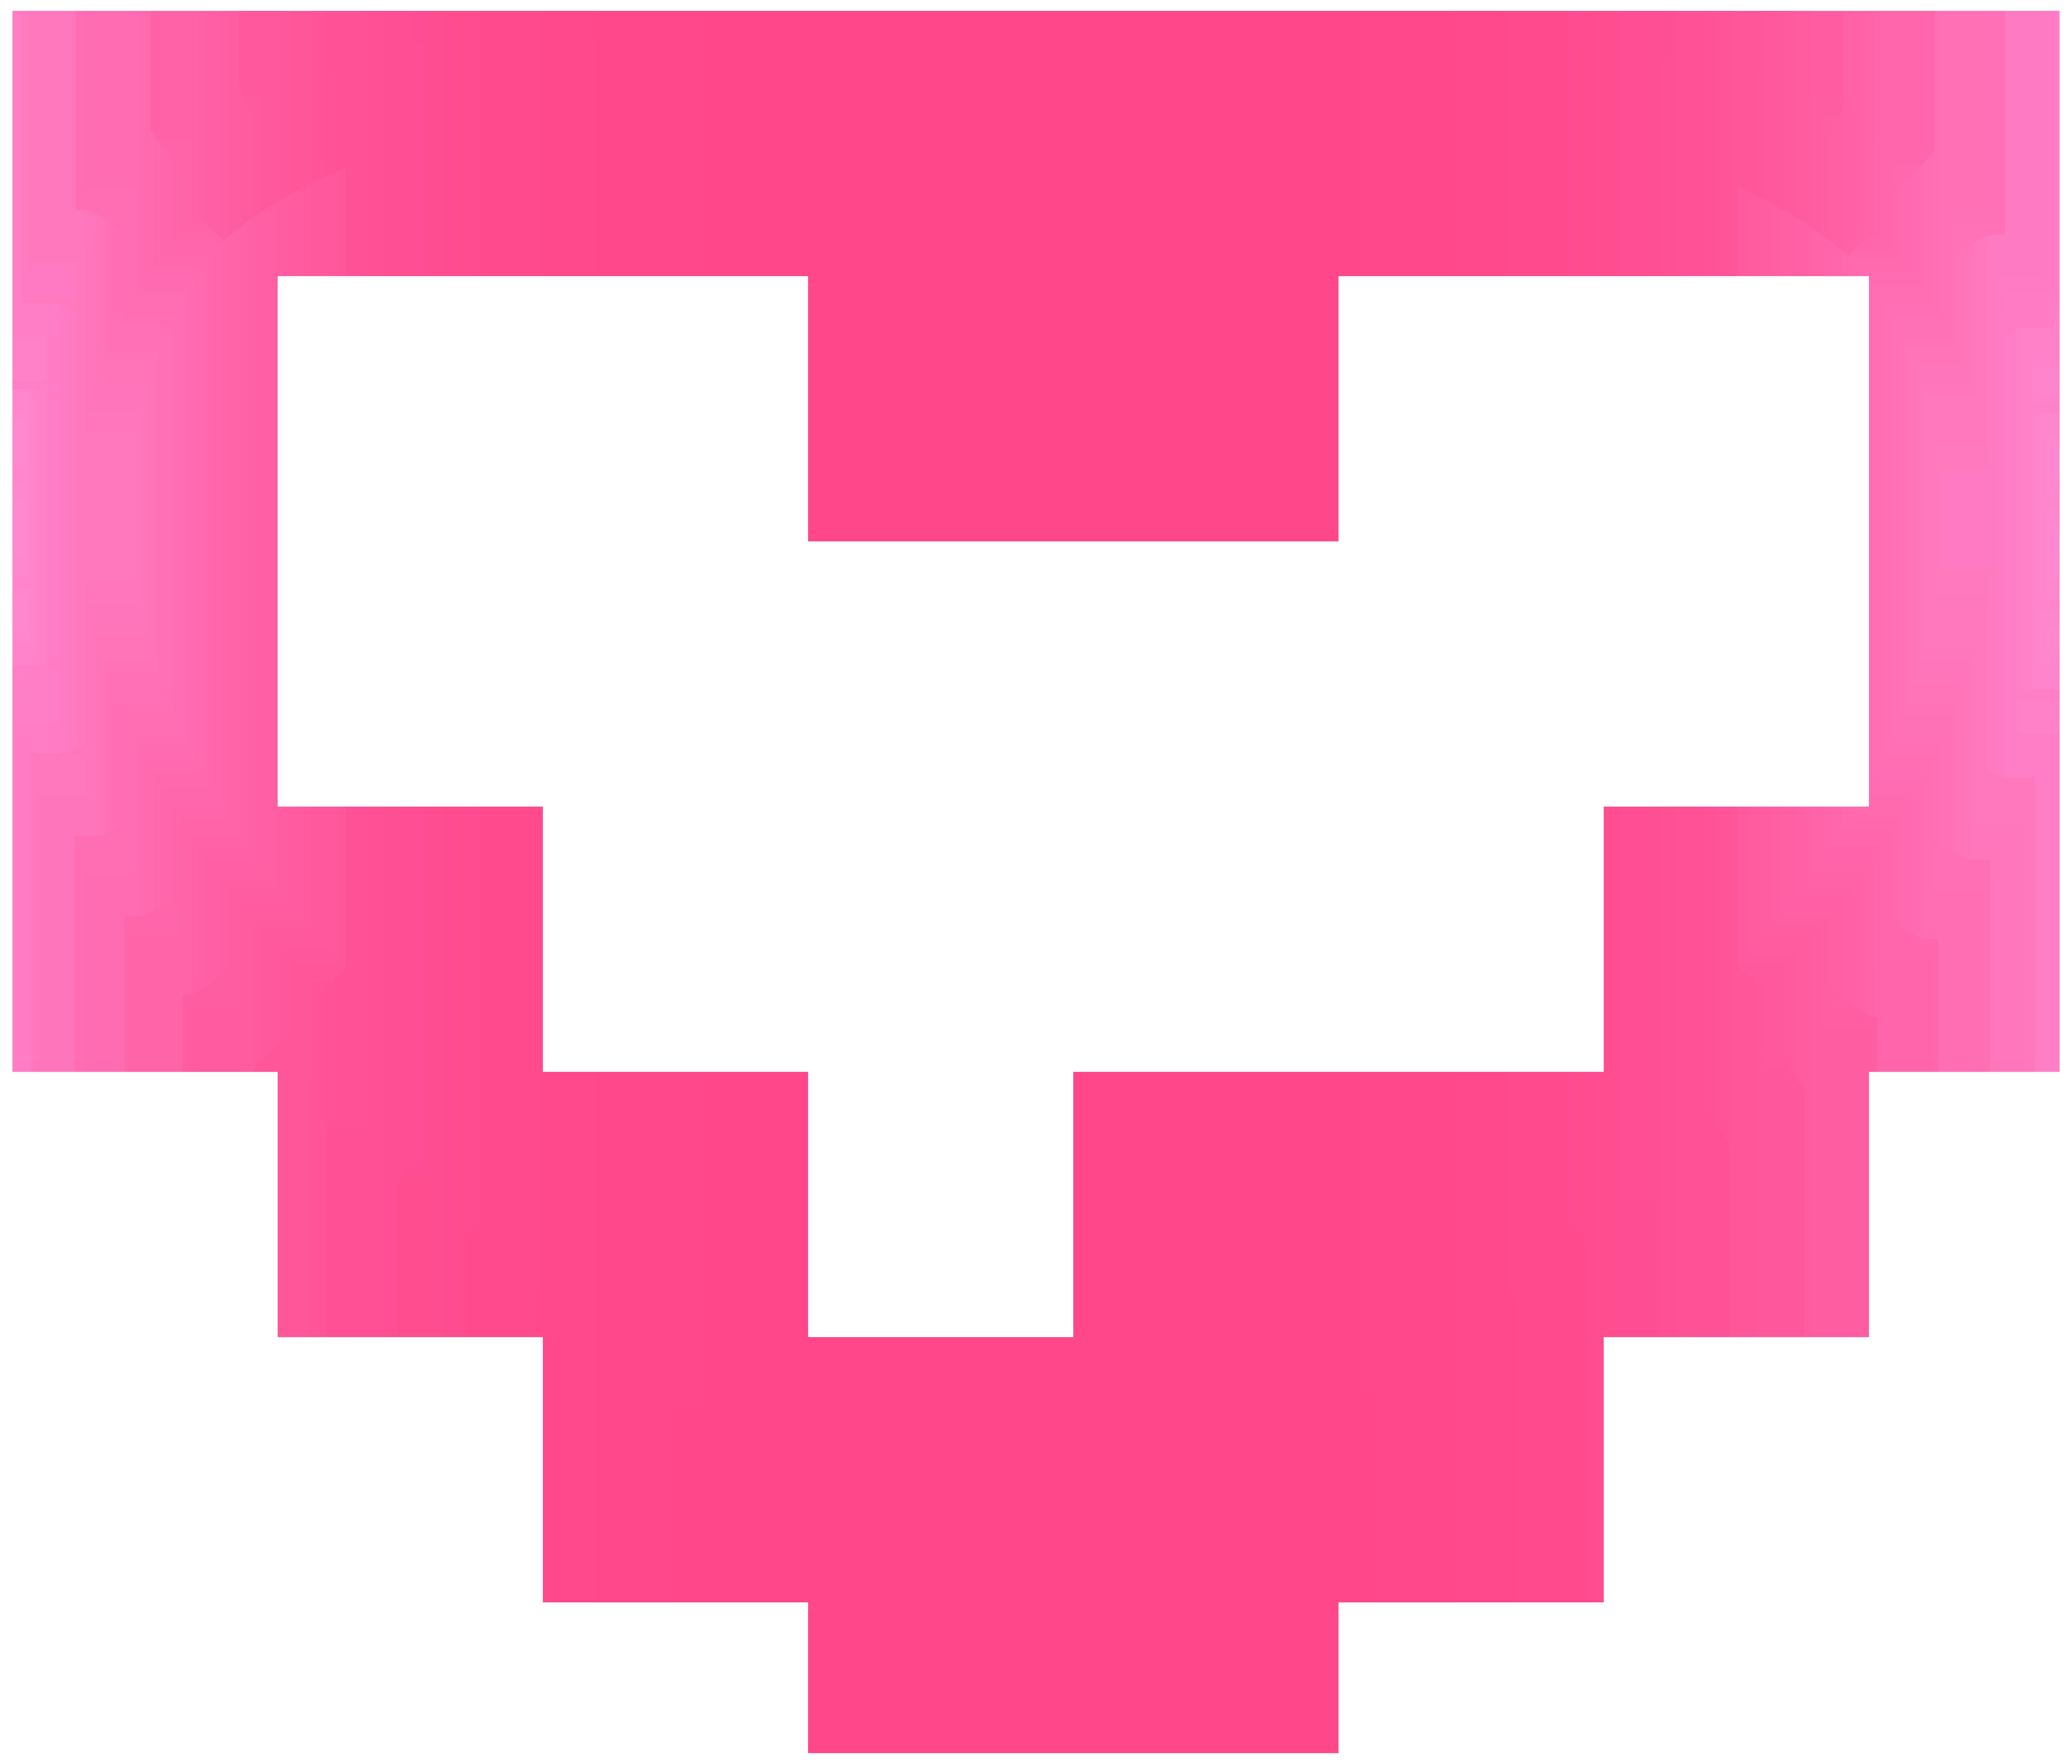 8000x6810 Pink Heart Border Frame Transparent PNG Clip Artu200b Gallery